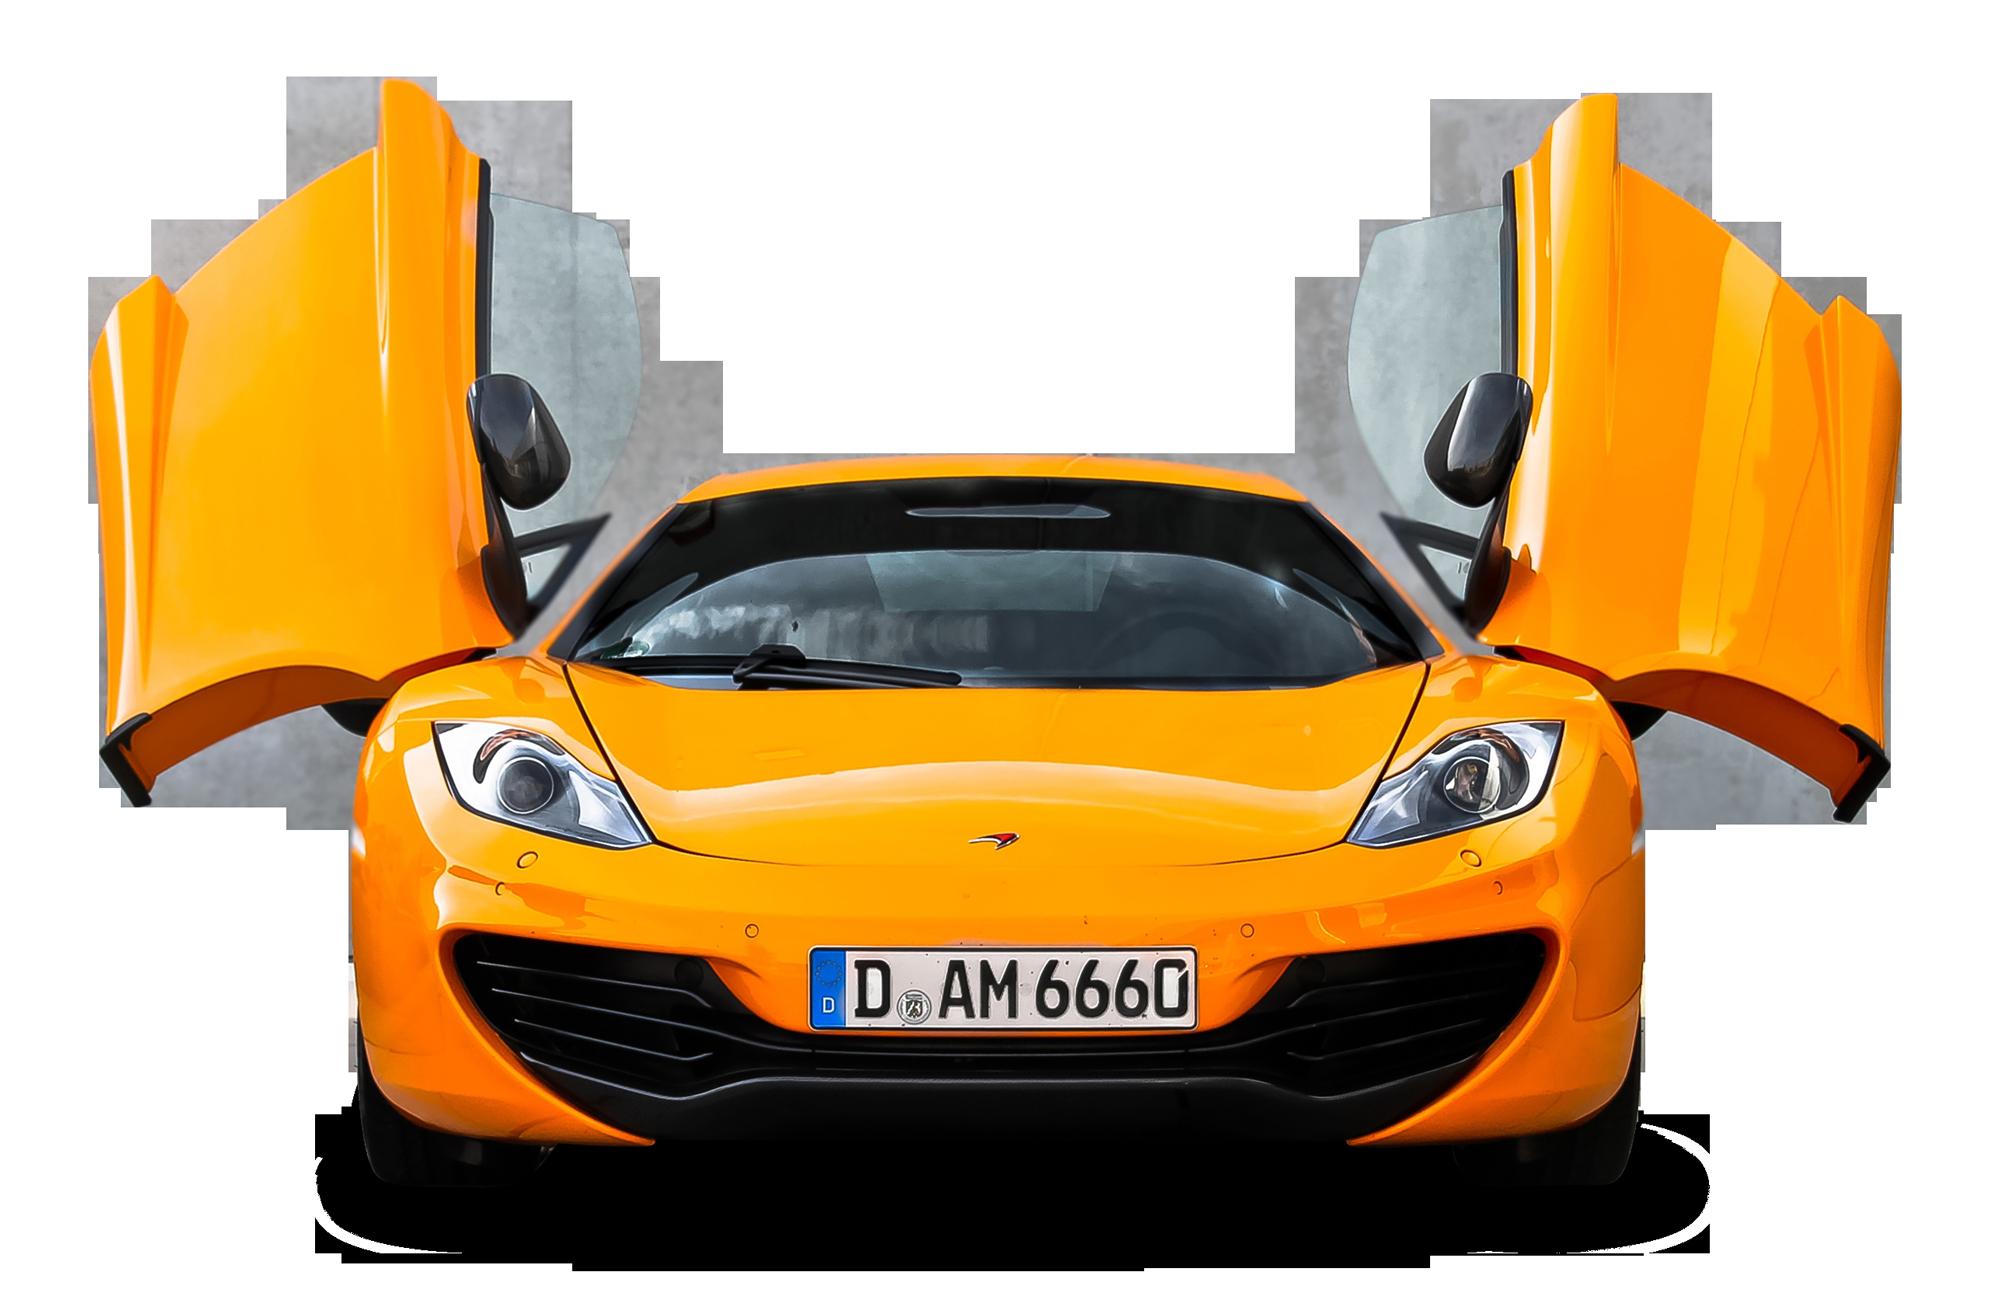 Jalopy car clipart clipart free Car PNG Transparent Car.PNG Images. | PlusPNG clipart free